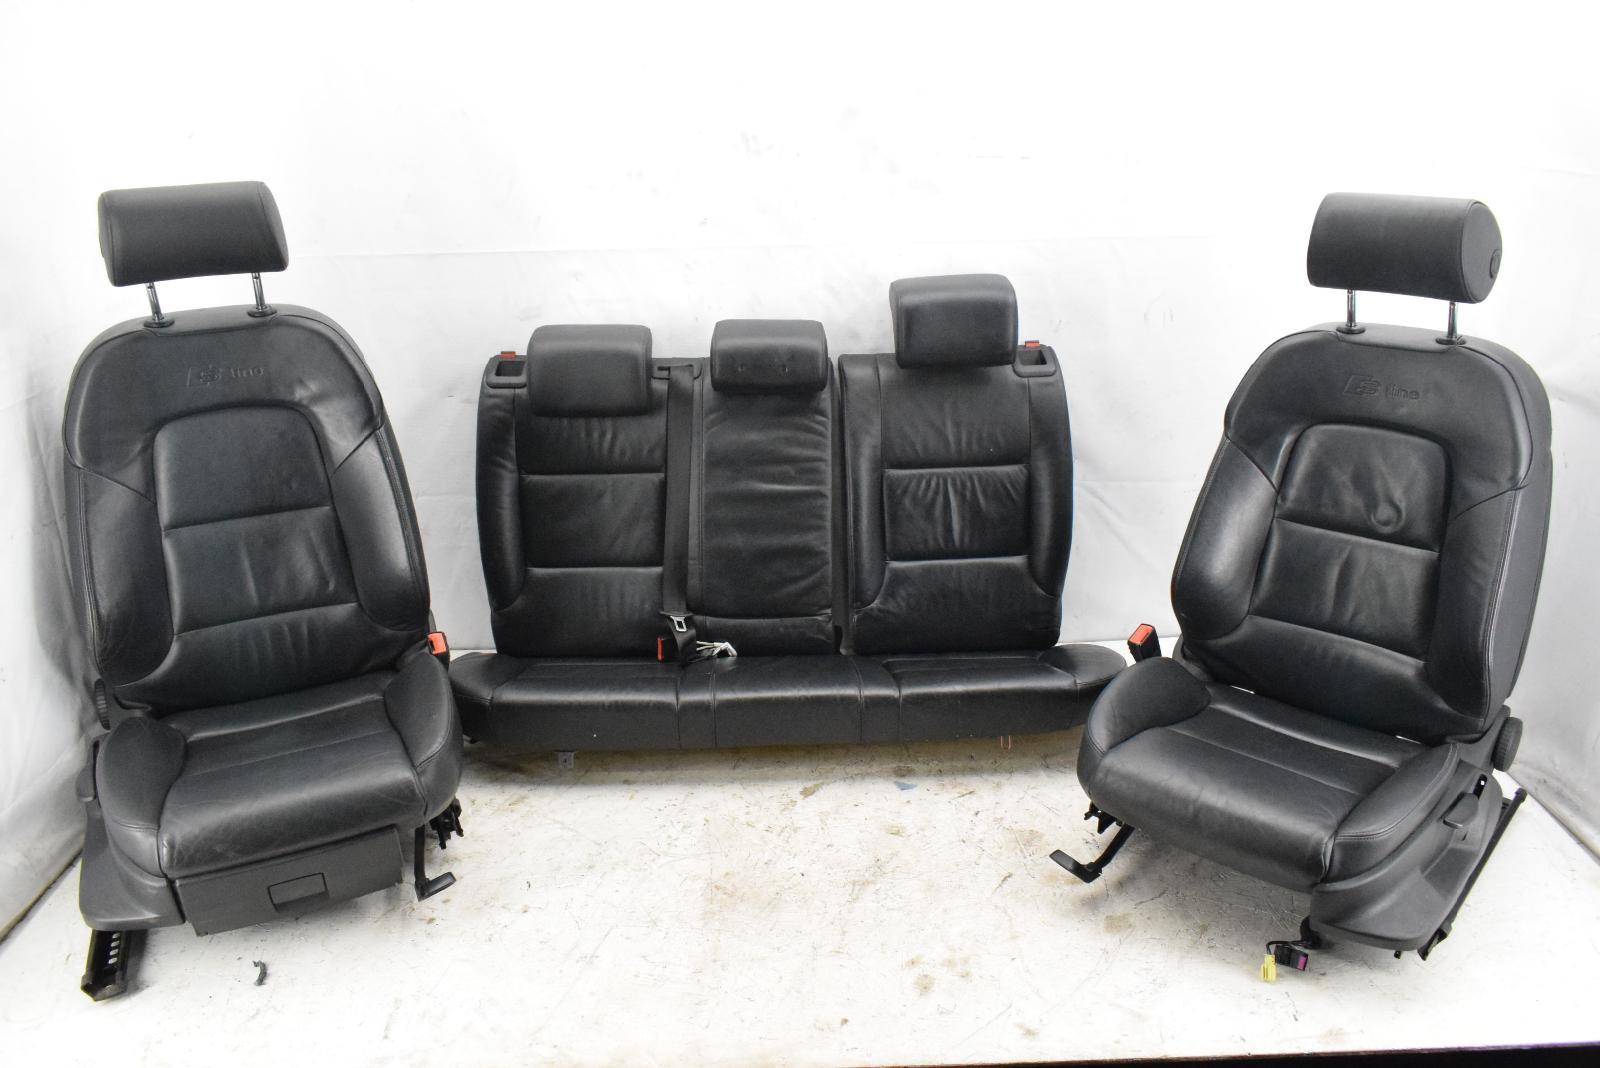 Audi A3 8P 3.2 S-LINE 4 Tür Komplett Schwarz Leder Sitze Vorne & Heck | eBay